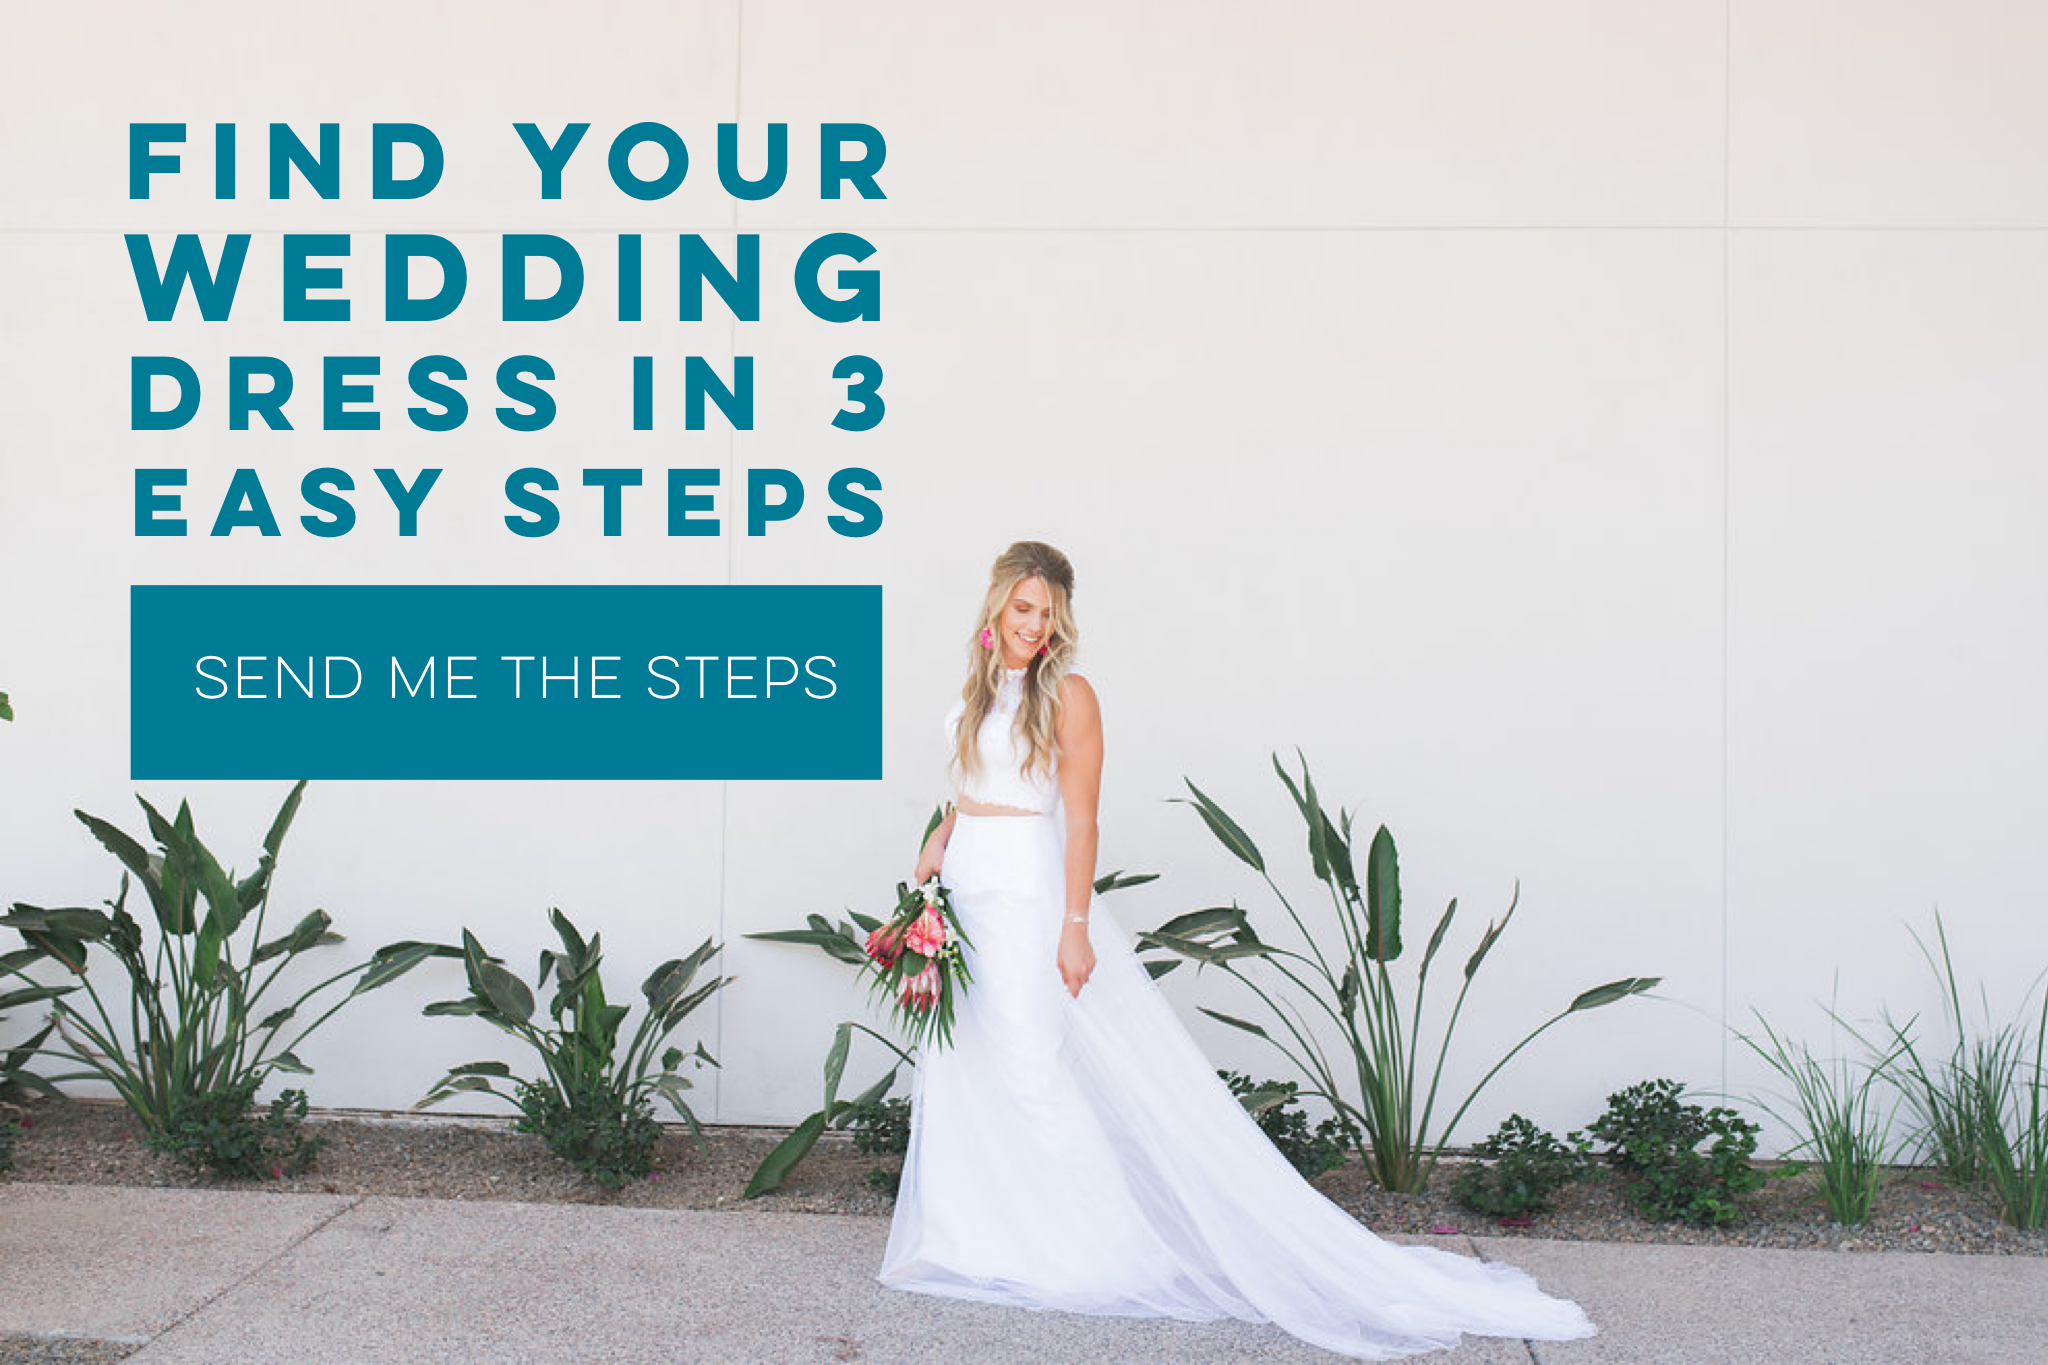 Find your wedding dress in 3 easy steps.jpg